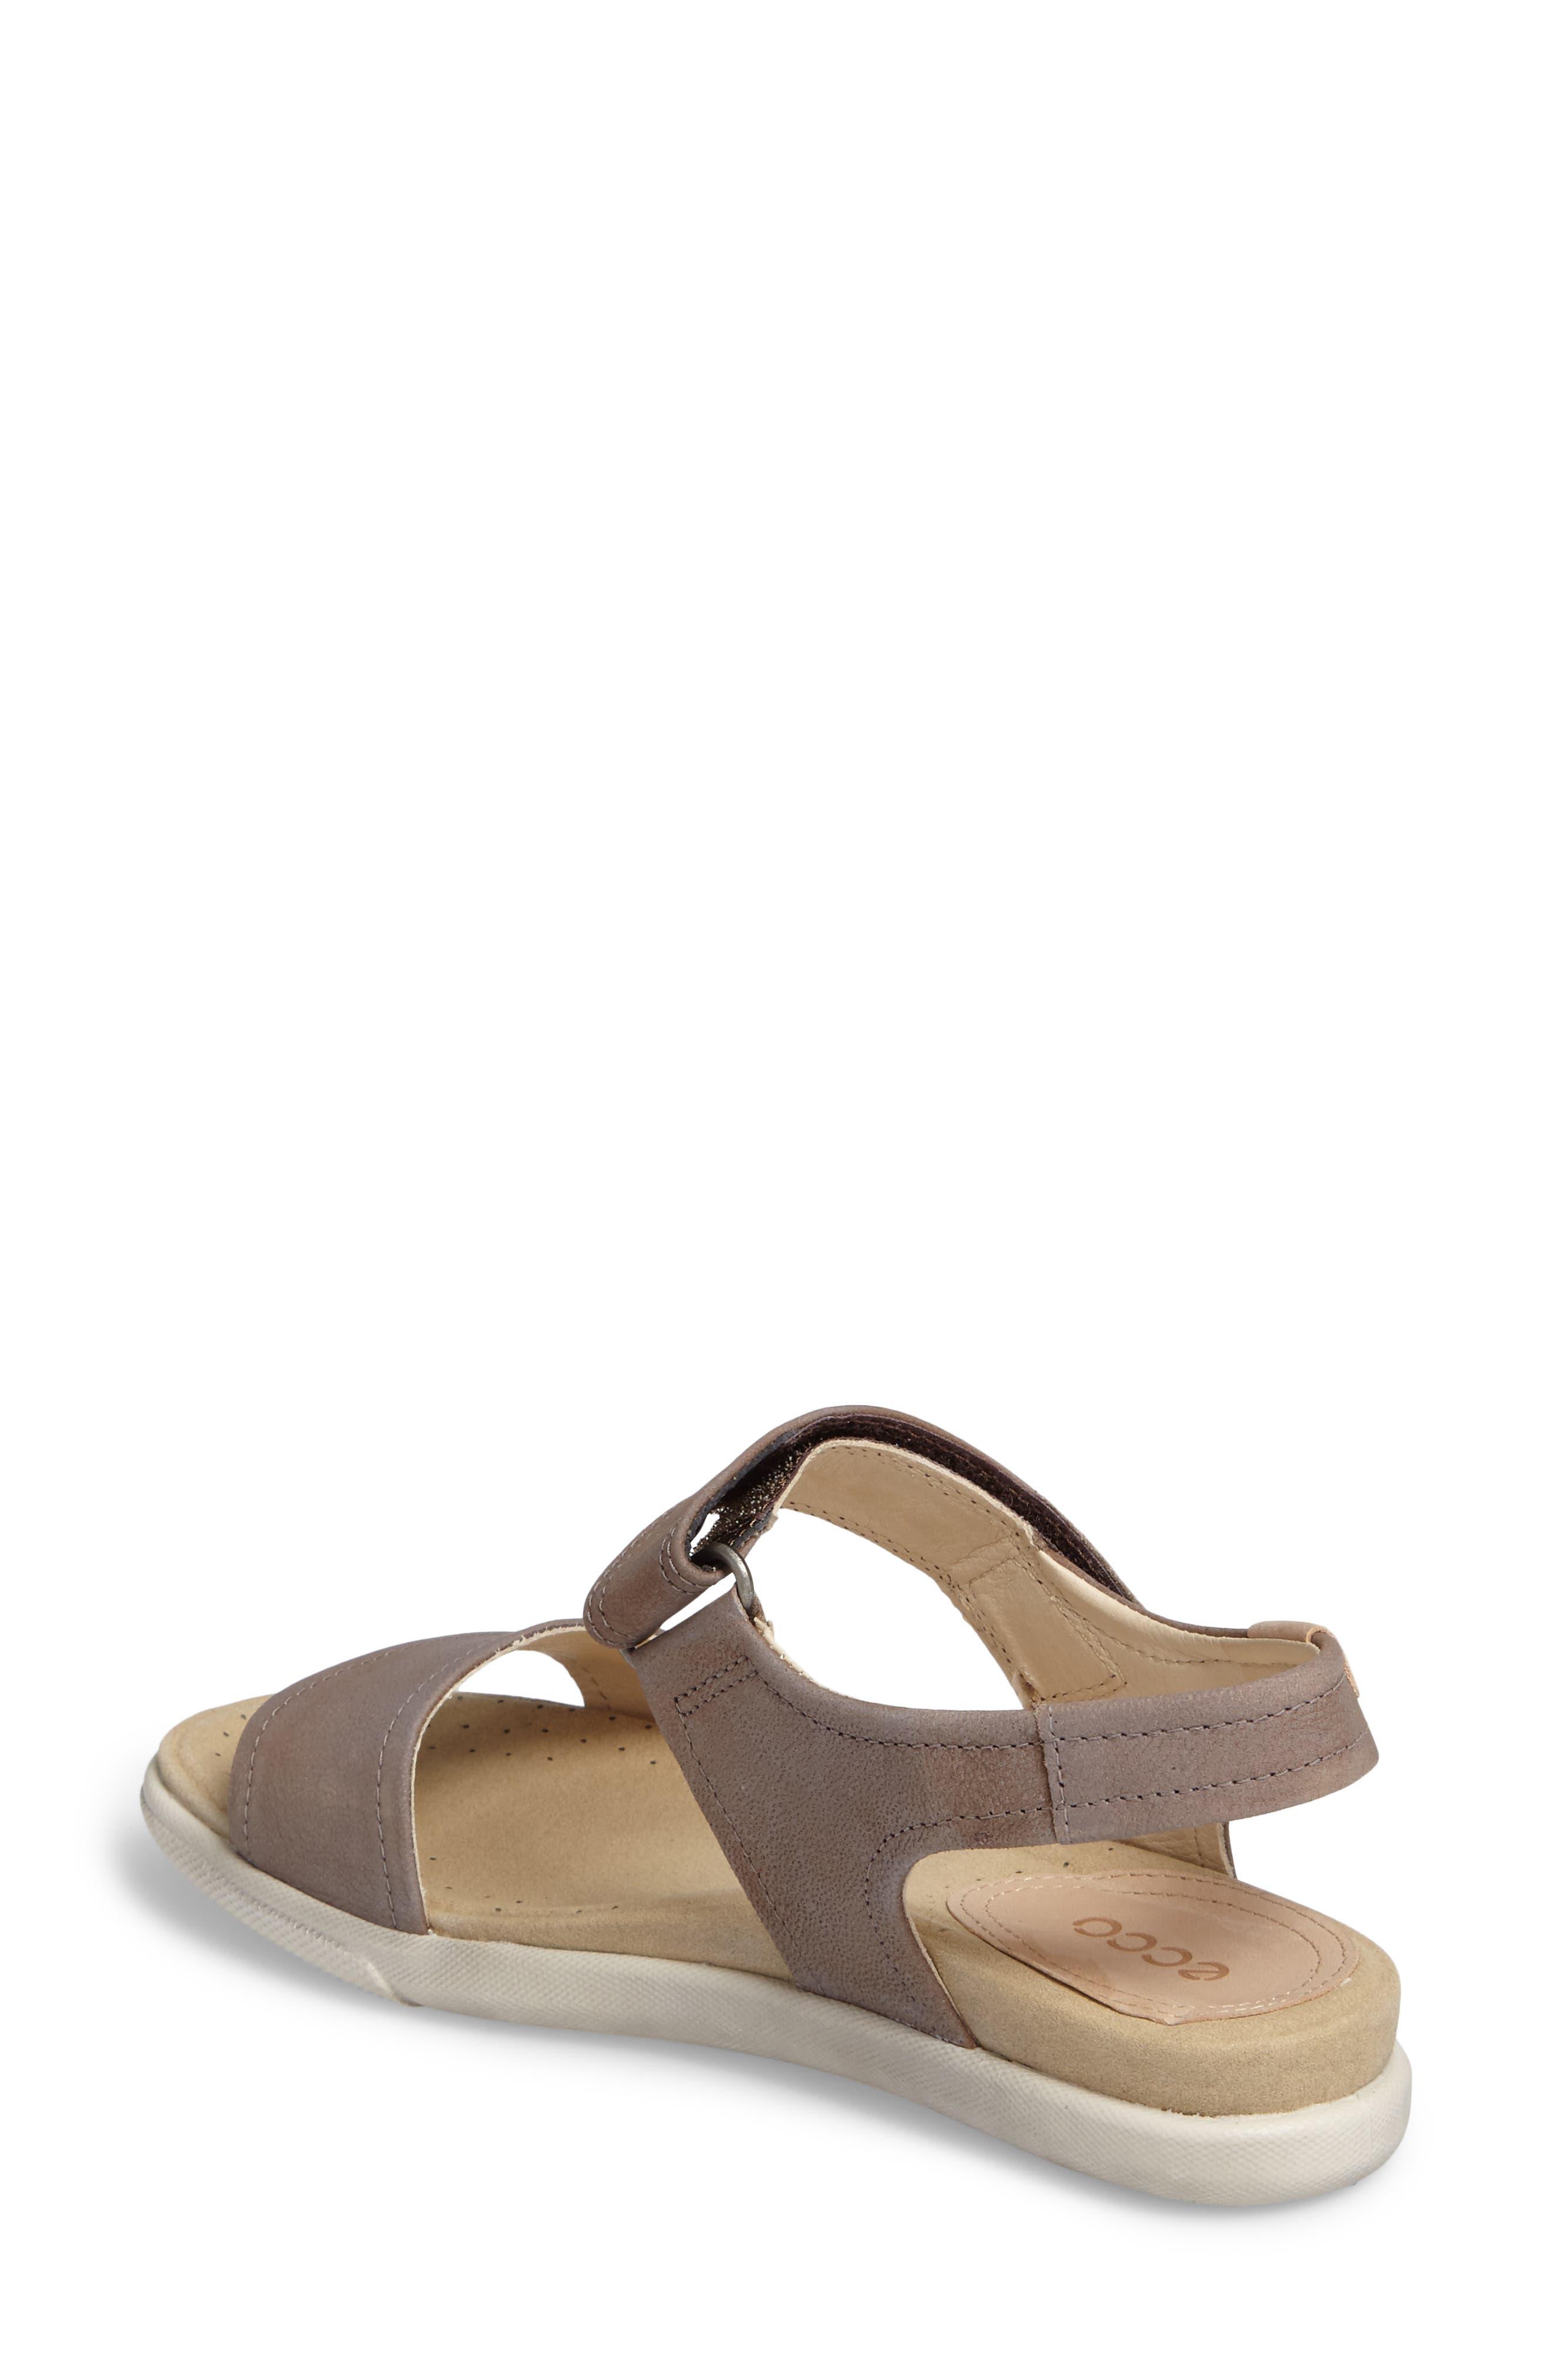 'Damara' Strap Sandal,                             Alternate thumbnail 5, color,